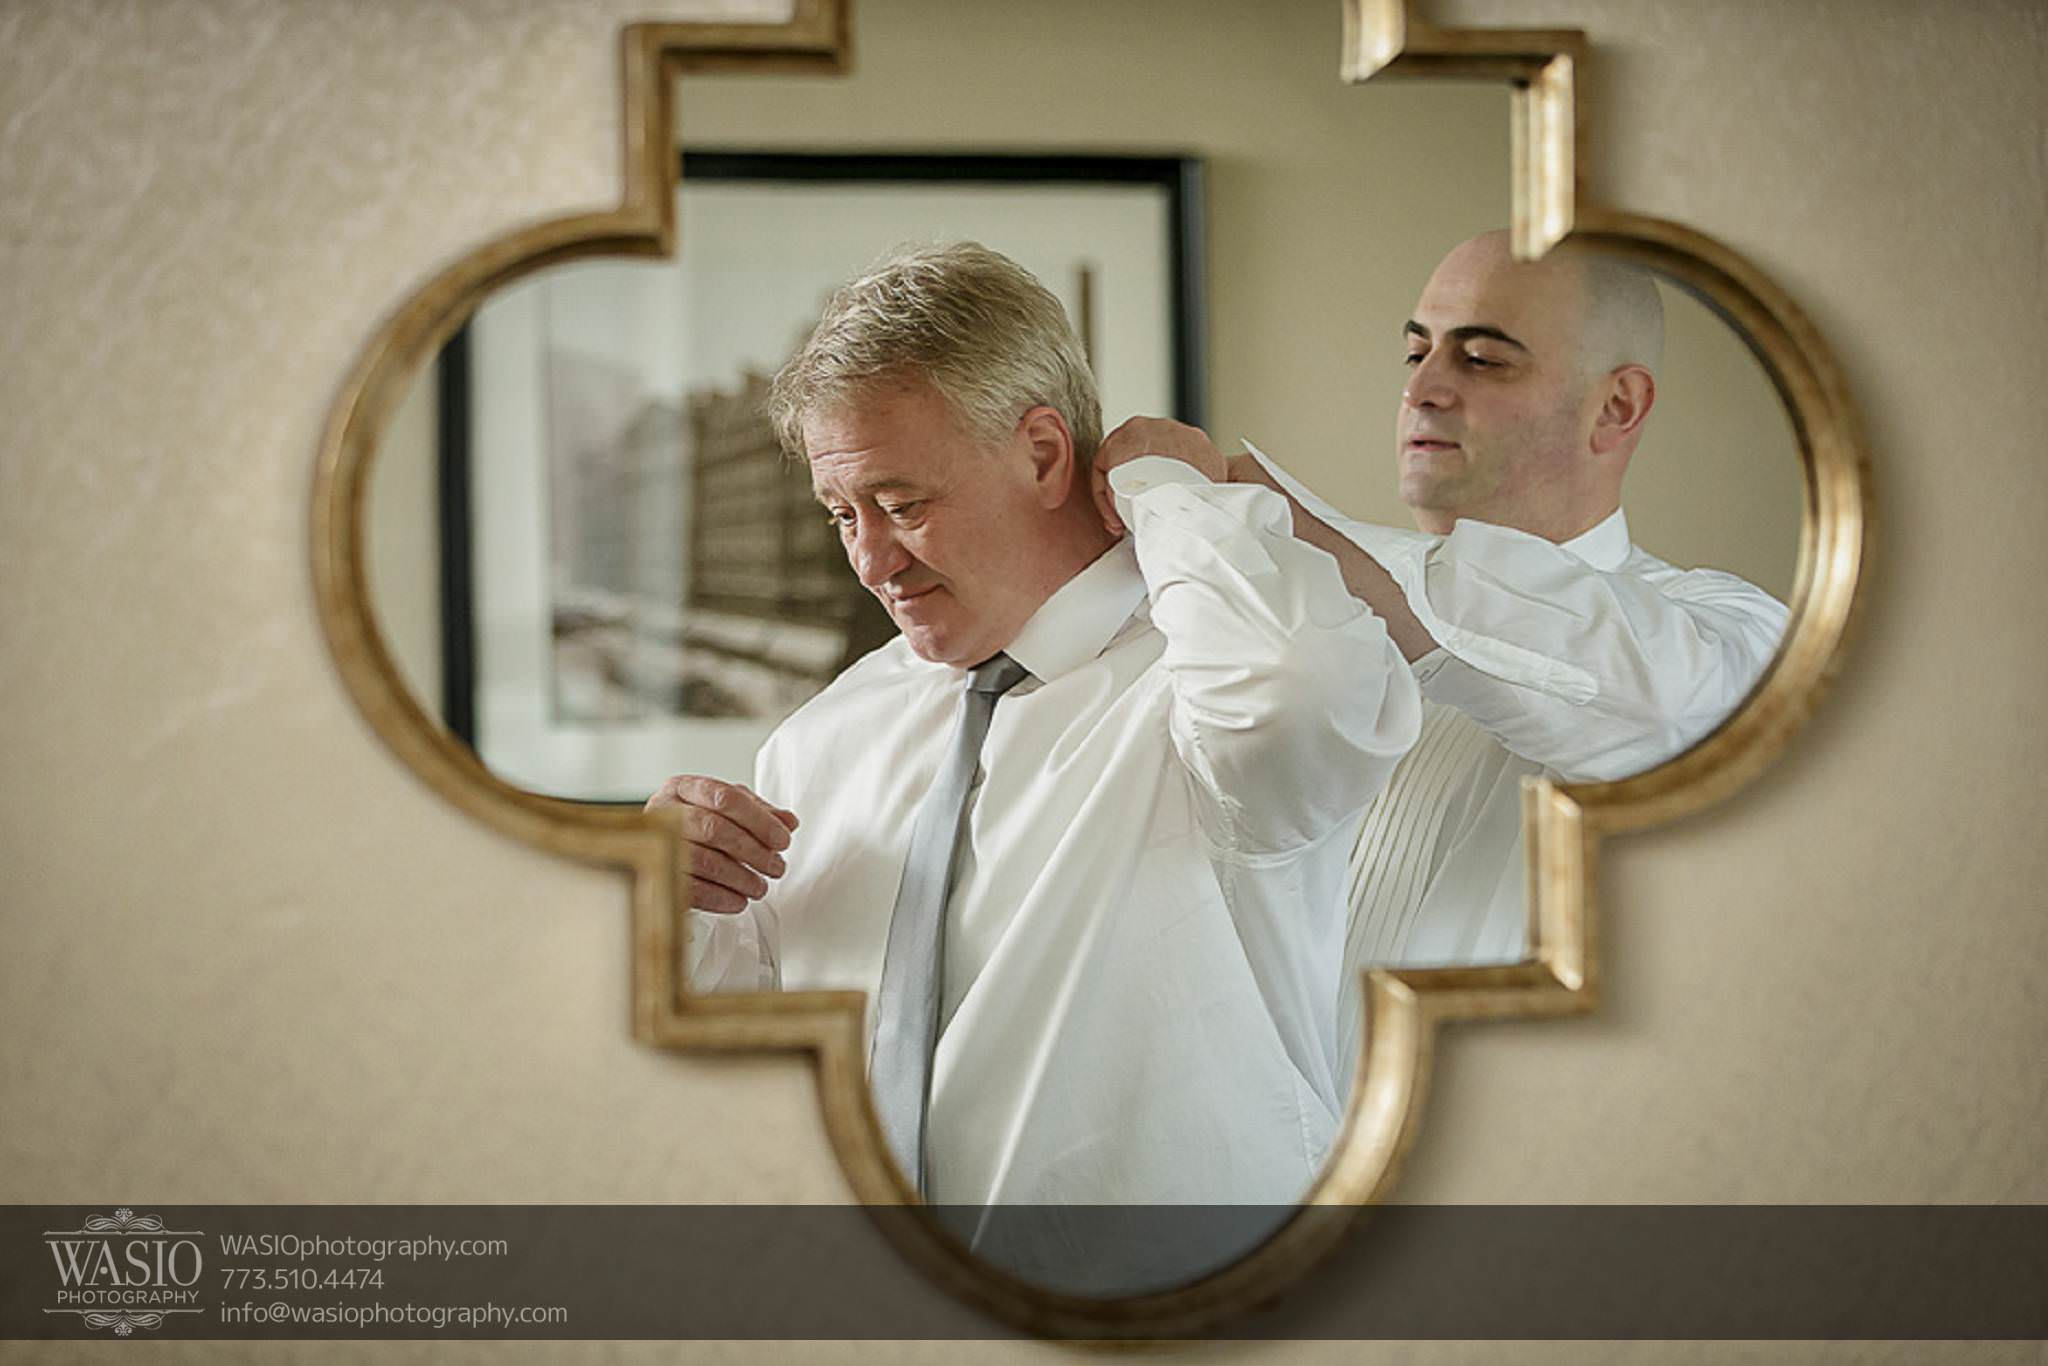 Chicago-wedding-photos-father-of-bride-groom-preparation-golden-mirror-036 Chicago Wedding Photos - Svetlana + Yuriy